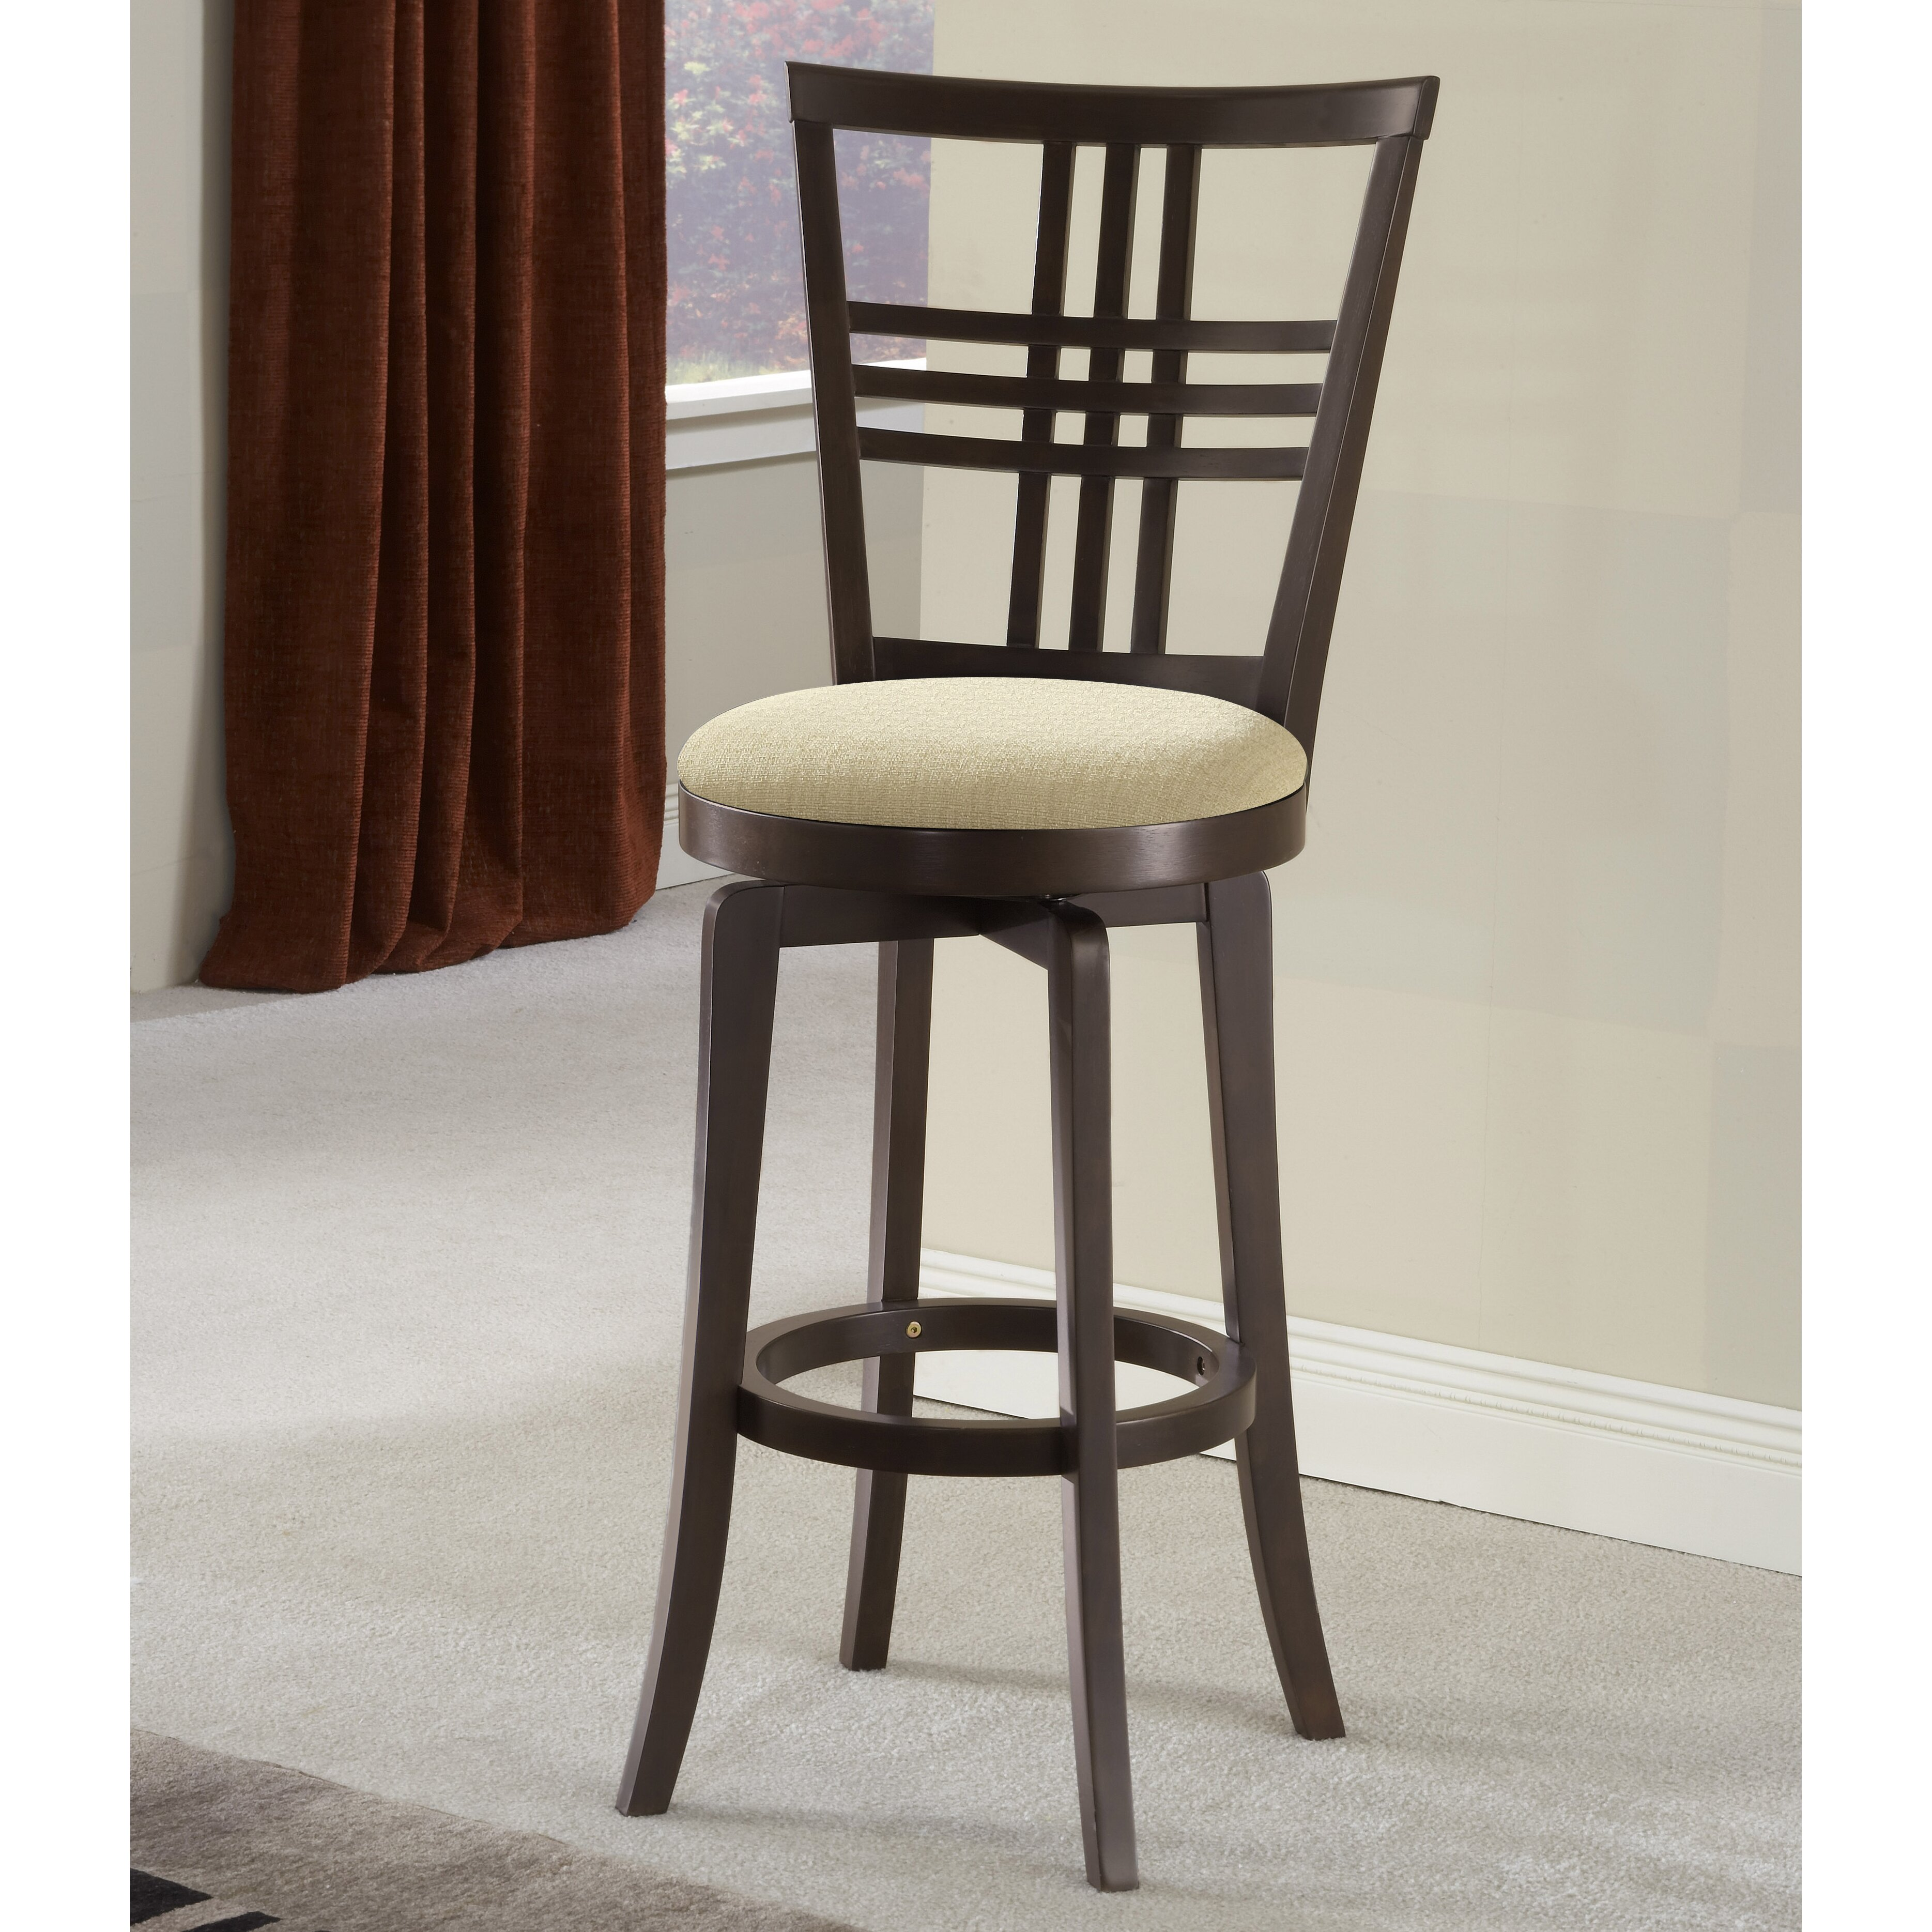 red barrel studio appalachian 30 swivel bar stool reviews wayfair. Black Bedroom Furniture Sets. Home Design Ideas